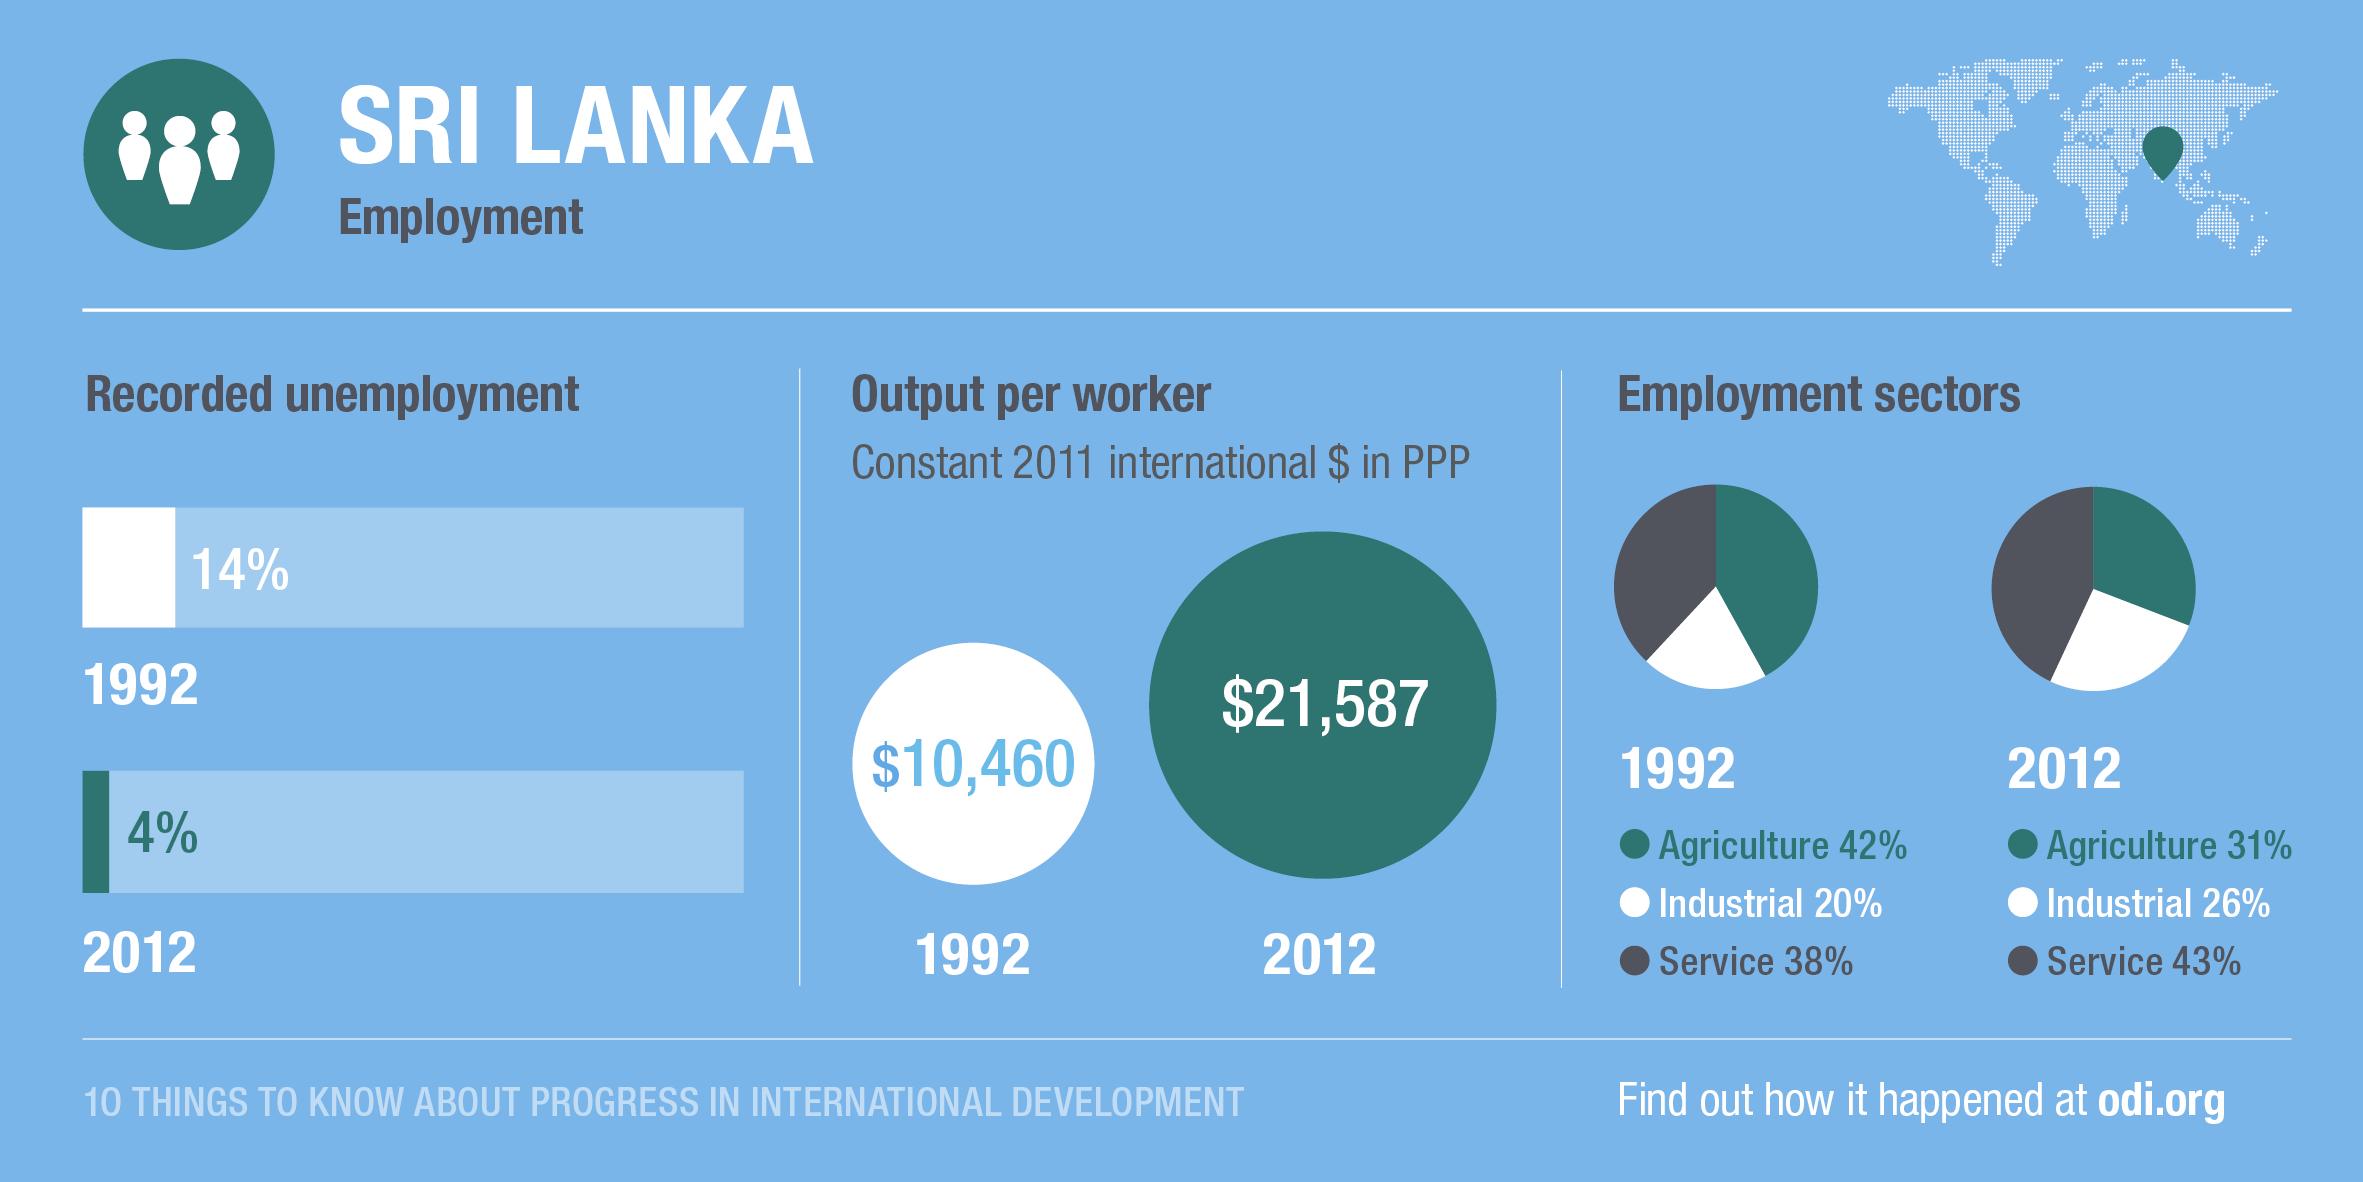 Sri Lanka's progress on employment